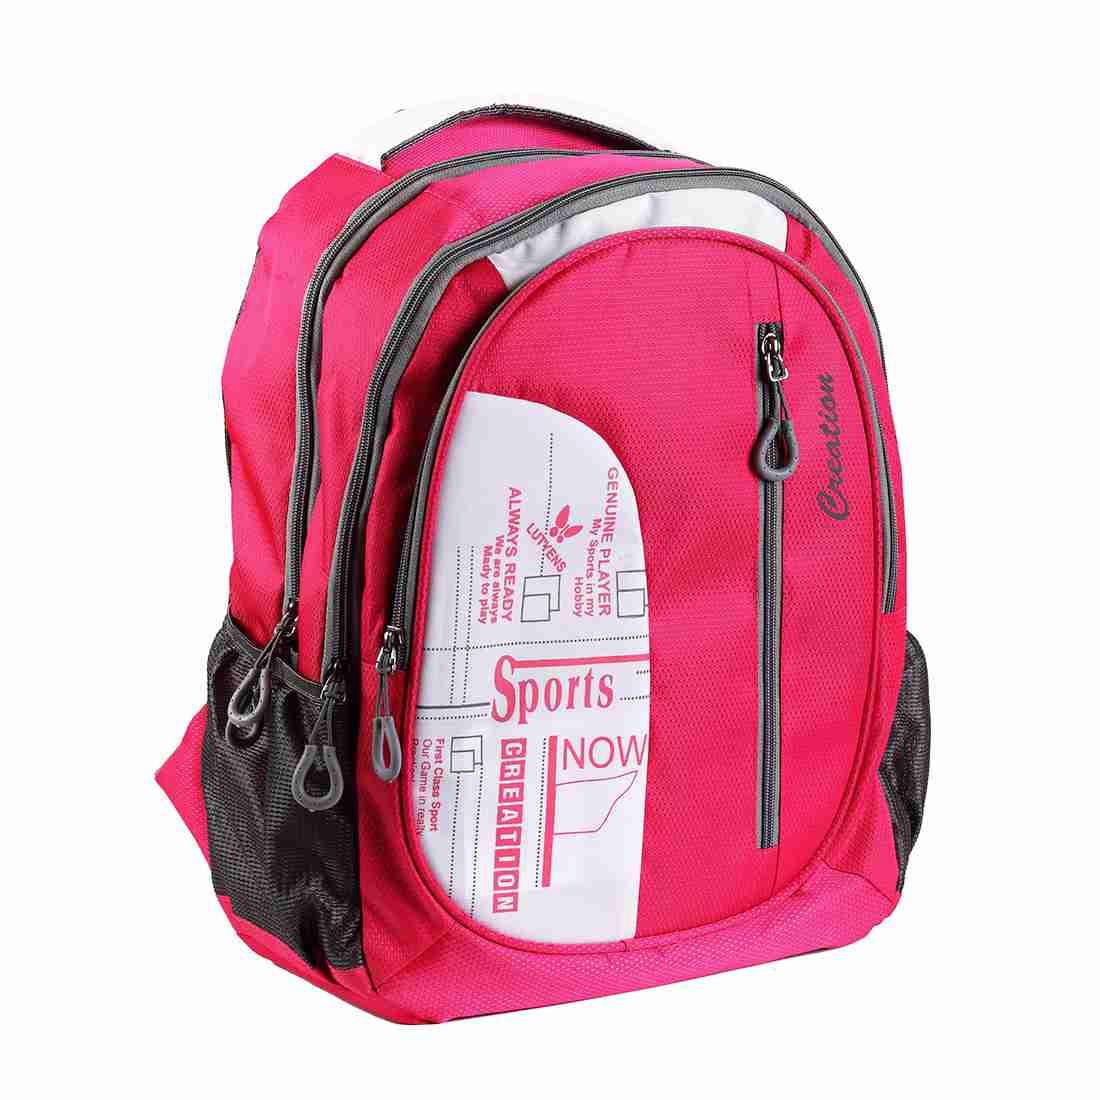 Creation 2008-L School Bags 32 L